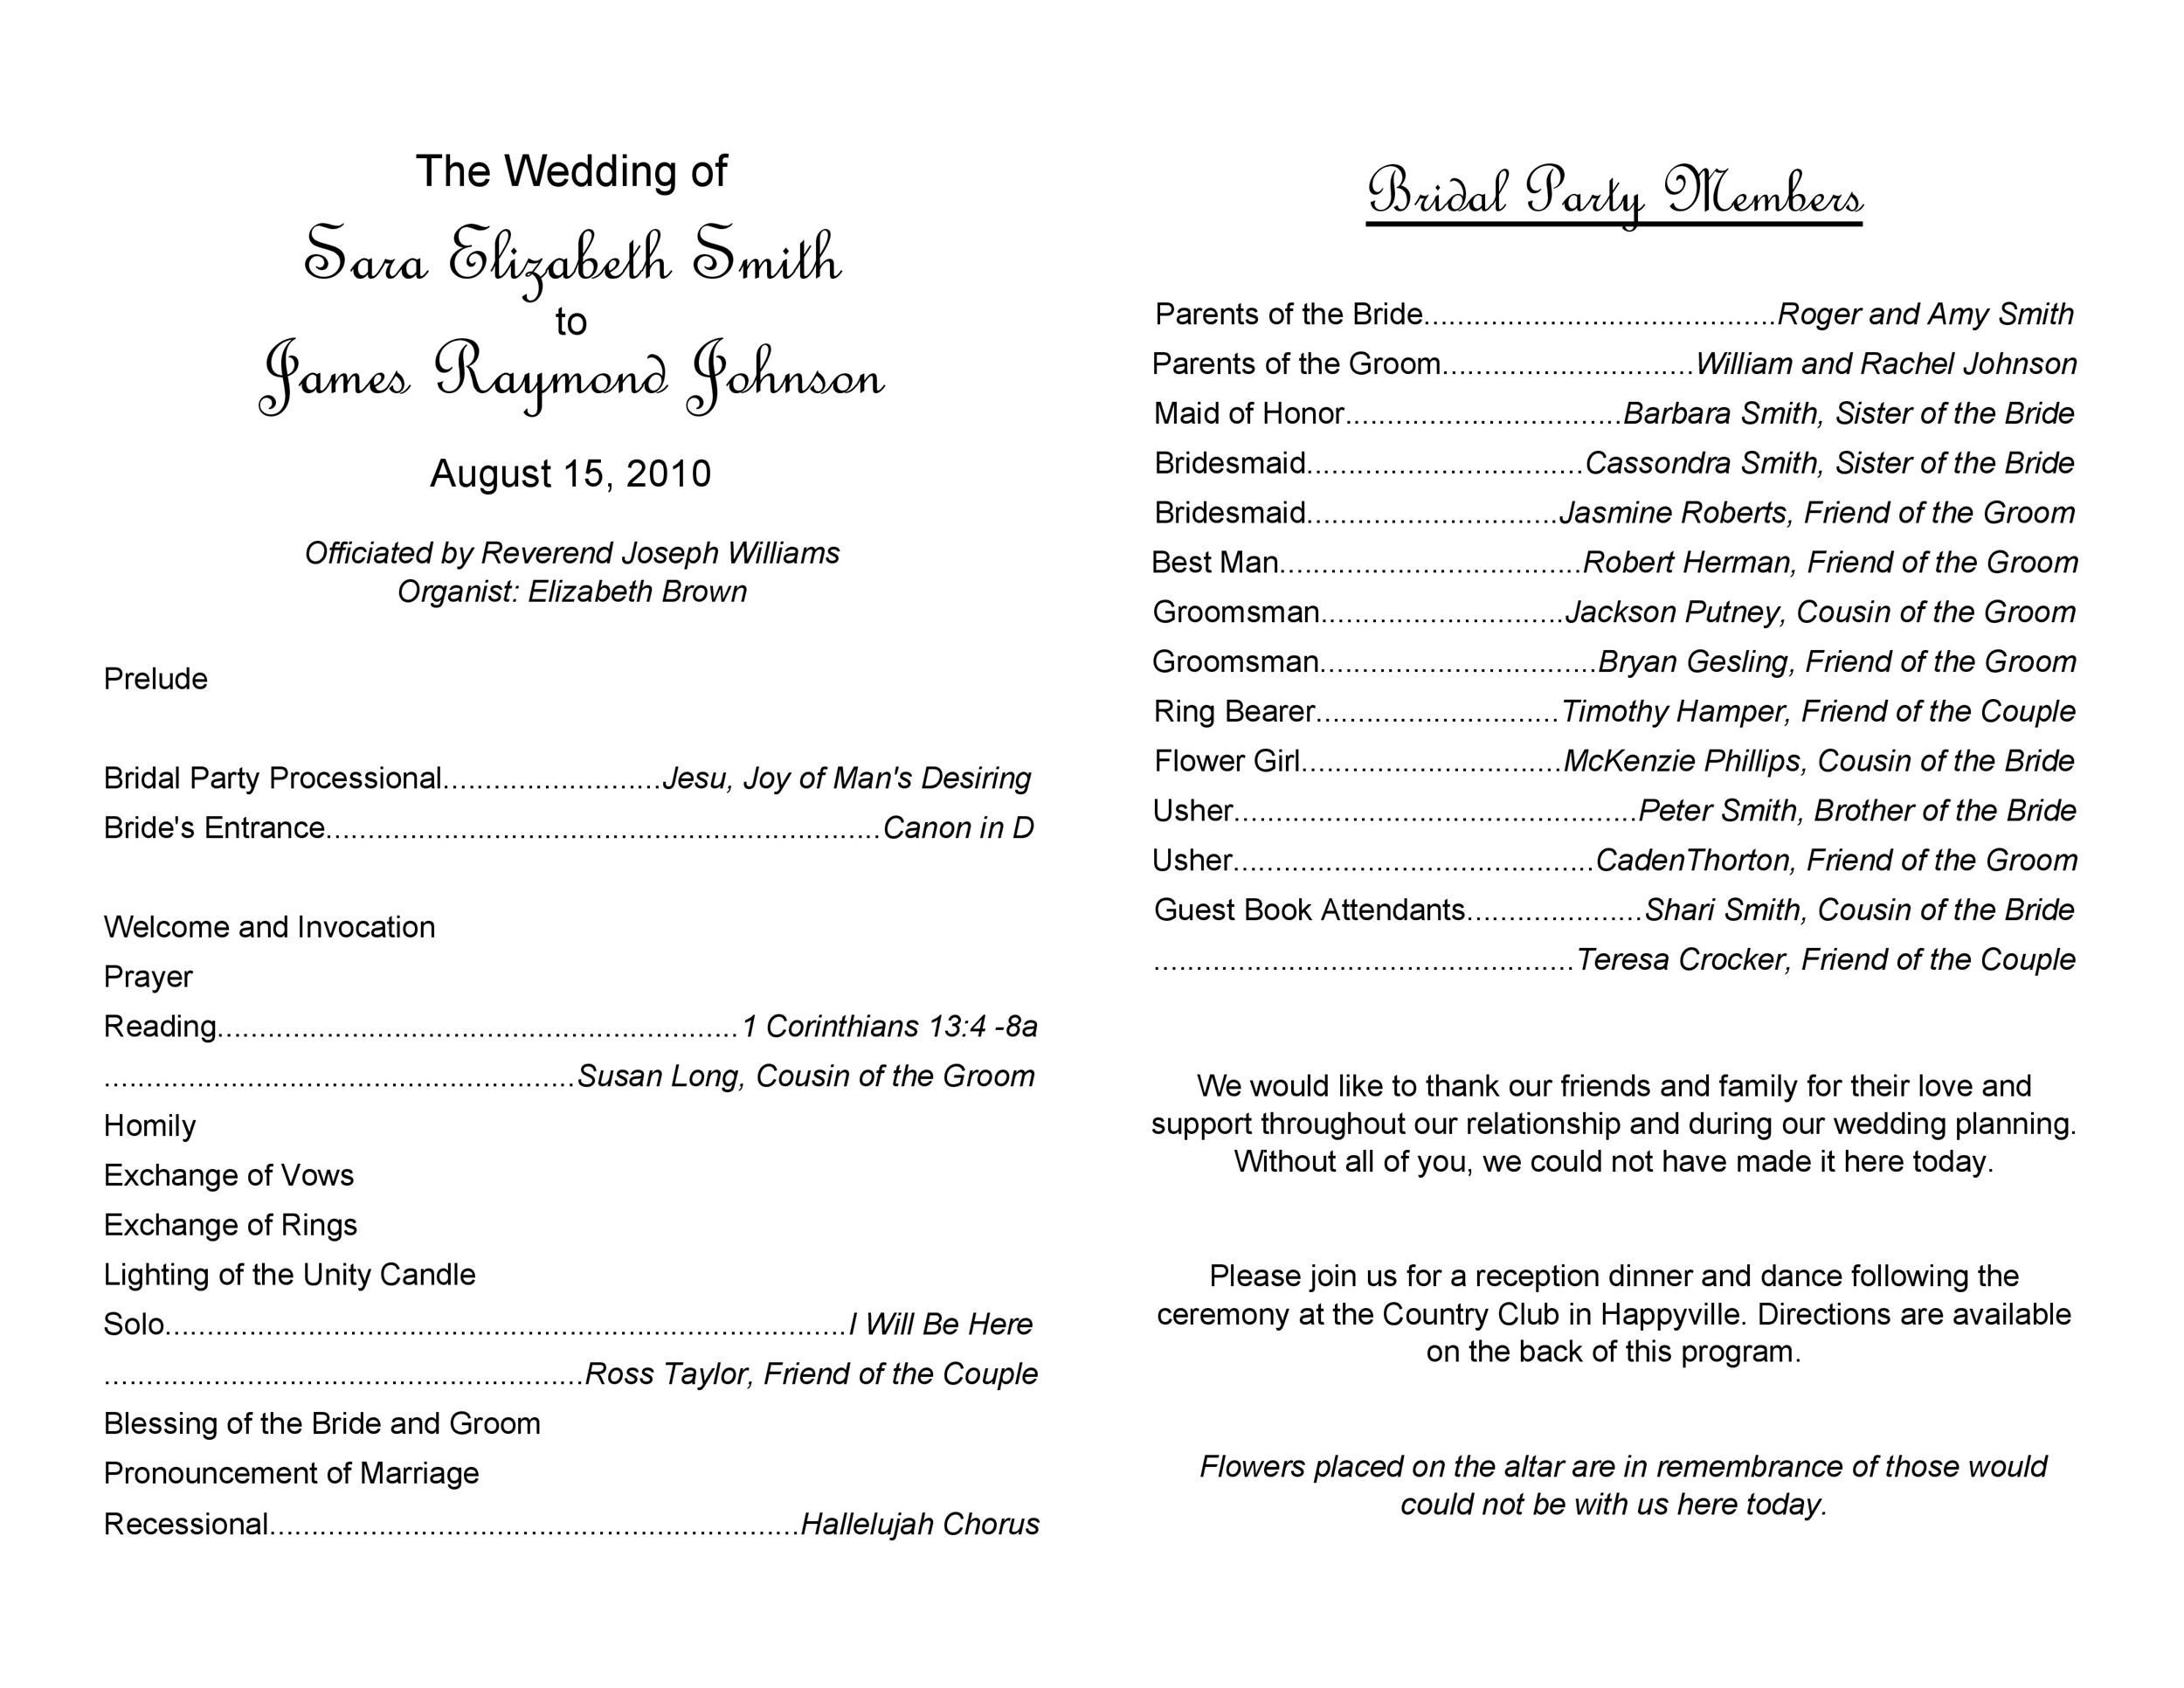 008 Best Free Printable Wedding Program Template High Definition  Templates Microsoft Word IndianFull